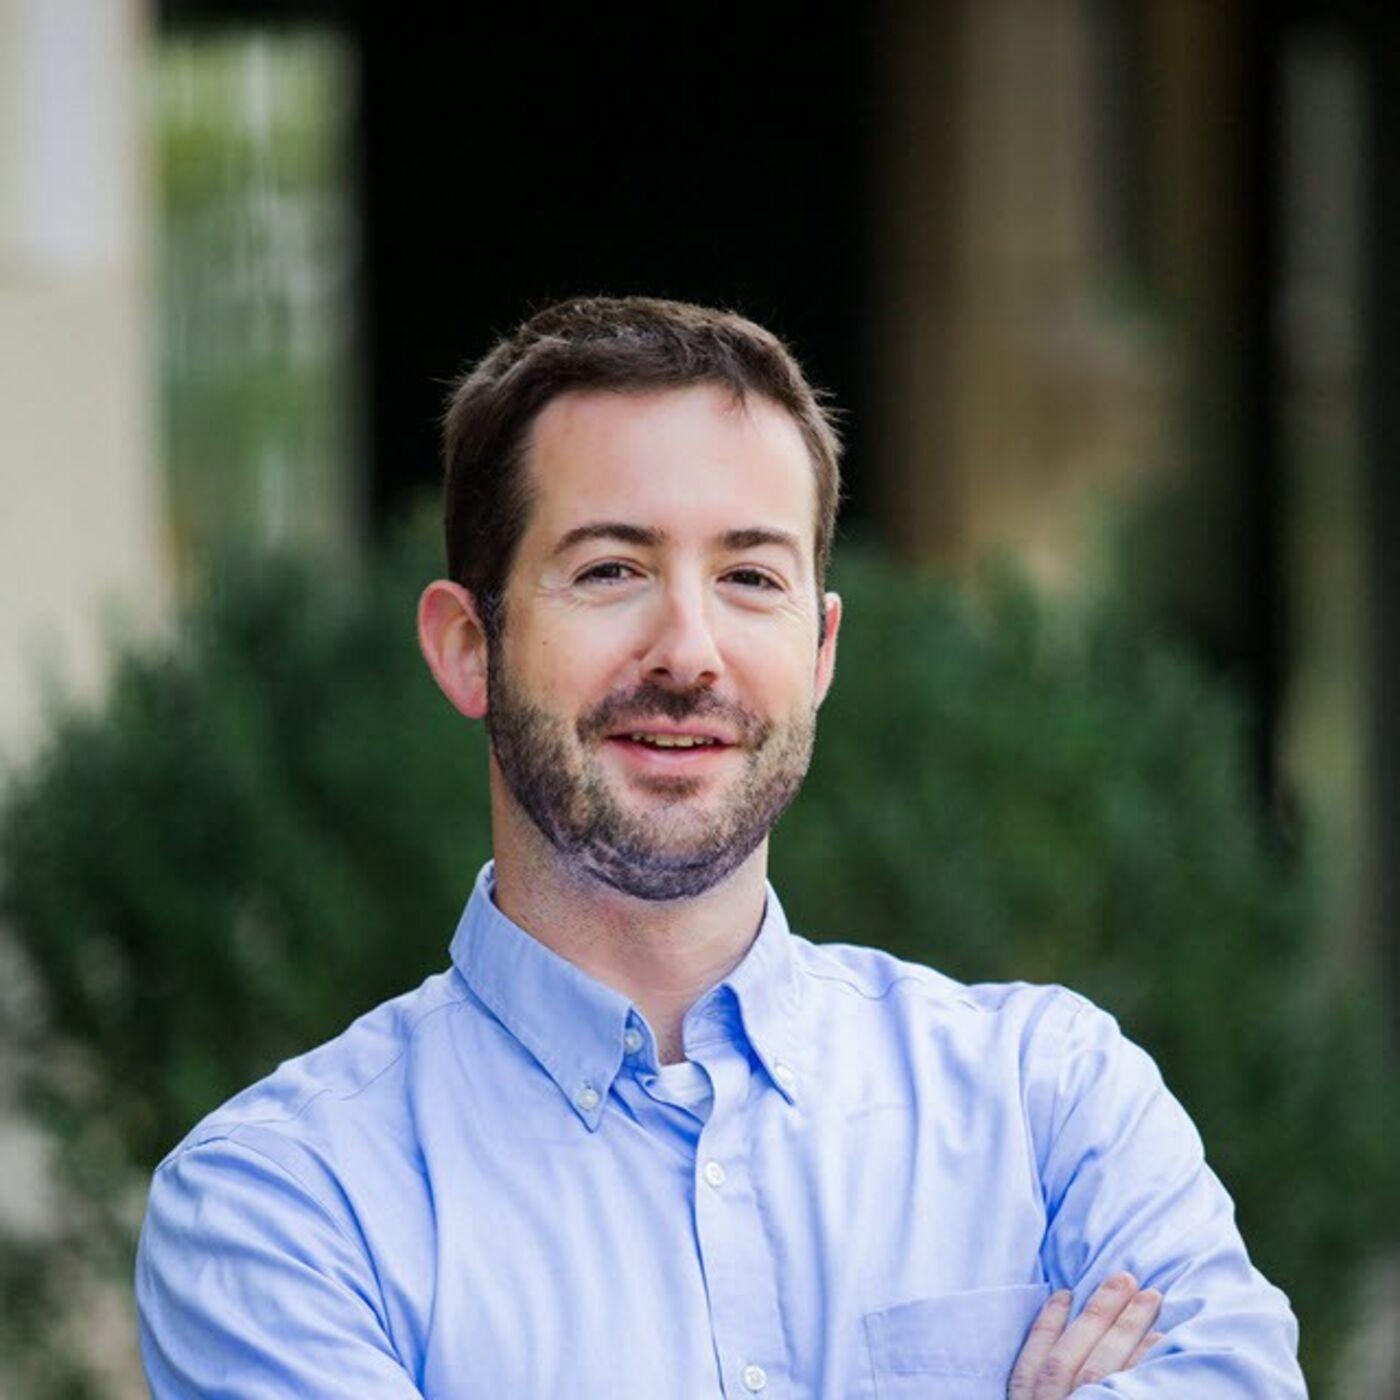 #3: Building a fully serverless insurance company with Joe Emison